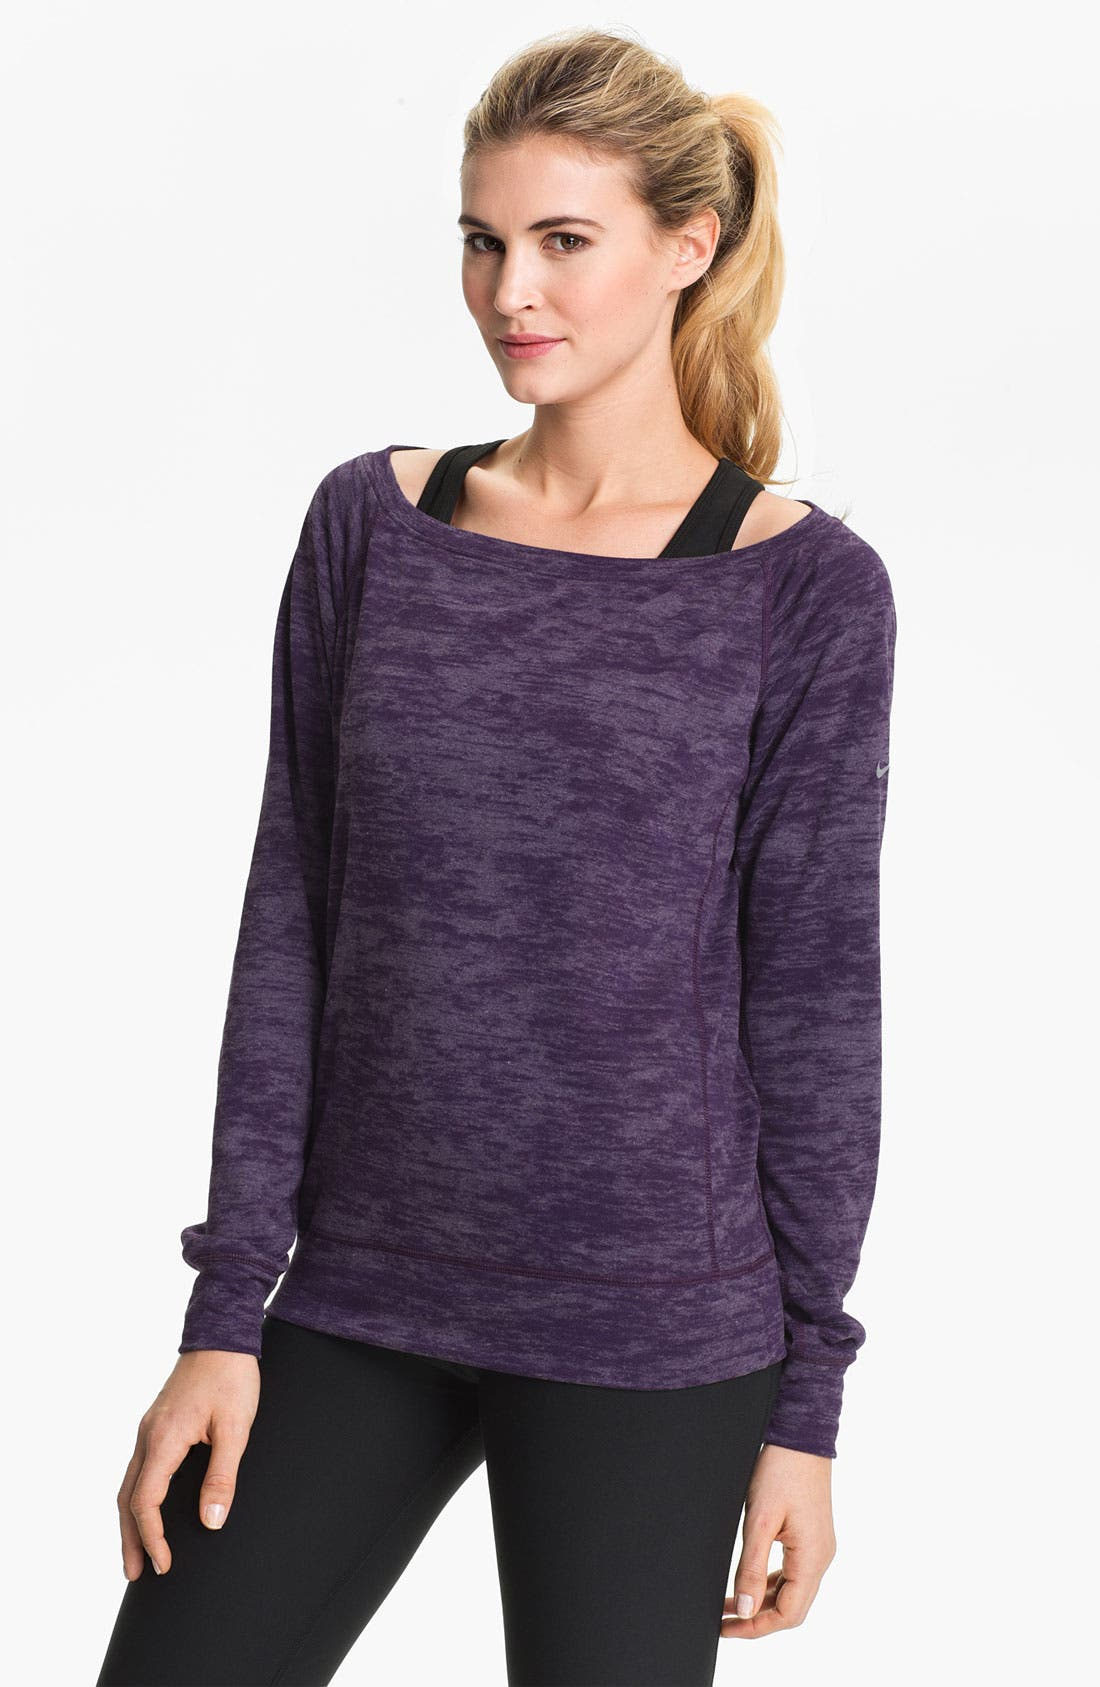 Alternate Image 1 Selected - Nike 'Critical Epic' Sweatshirt